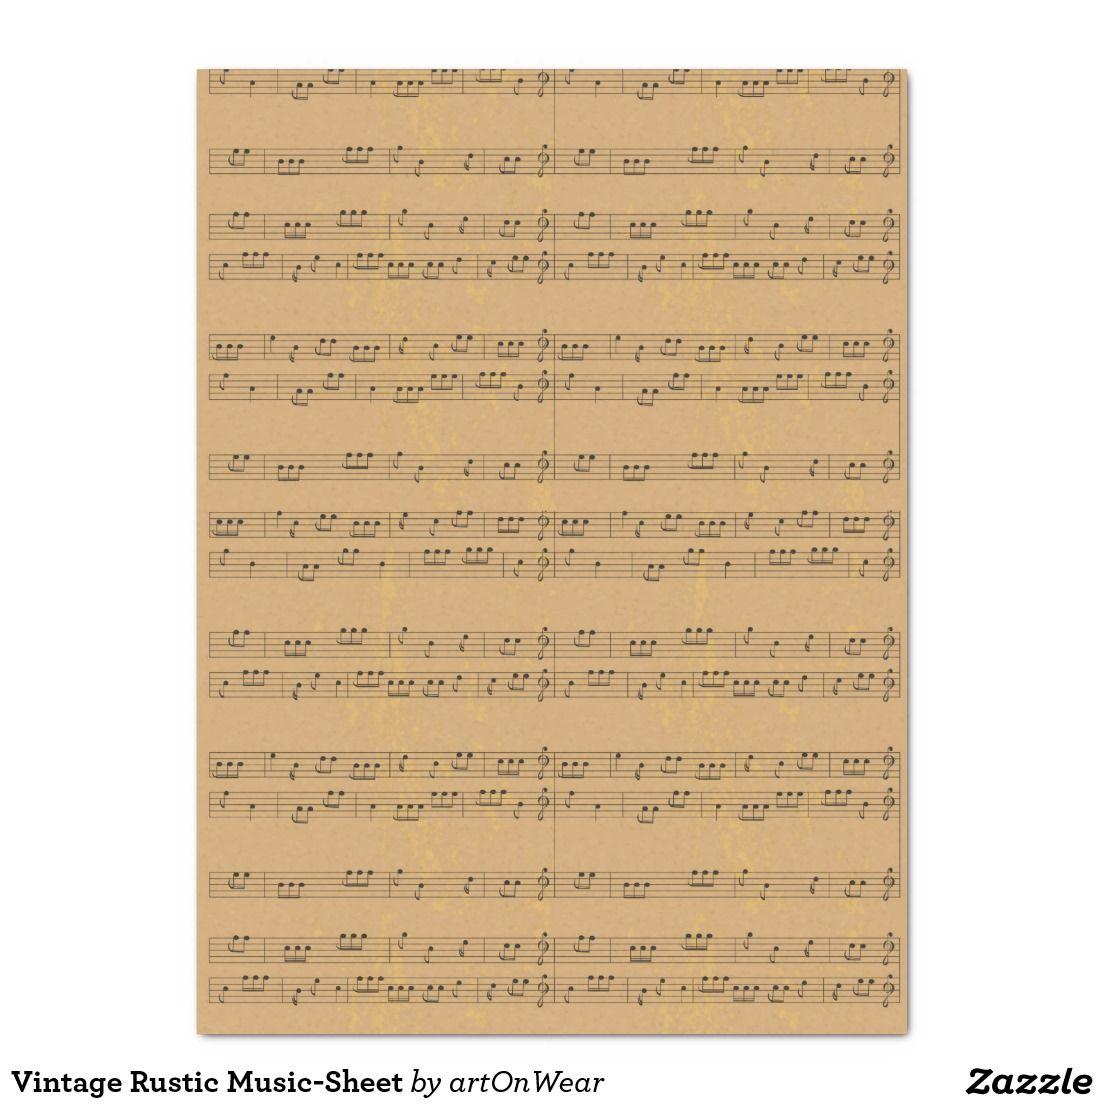 Vintage Rustic Music-Sheet